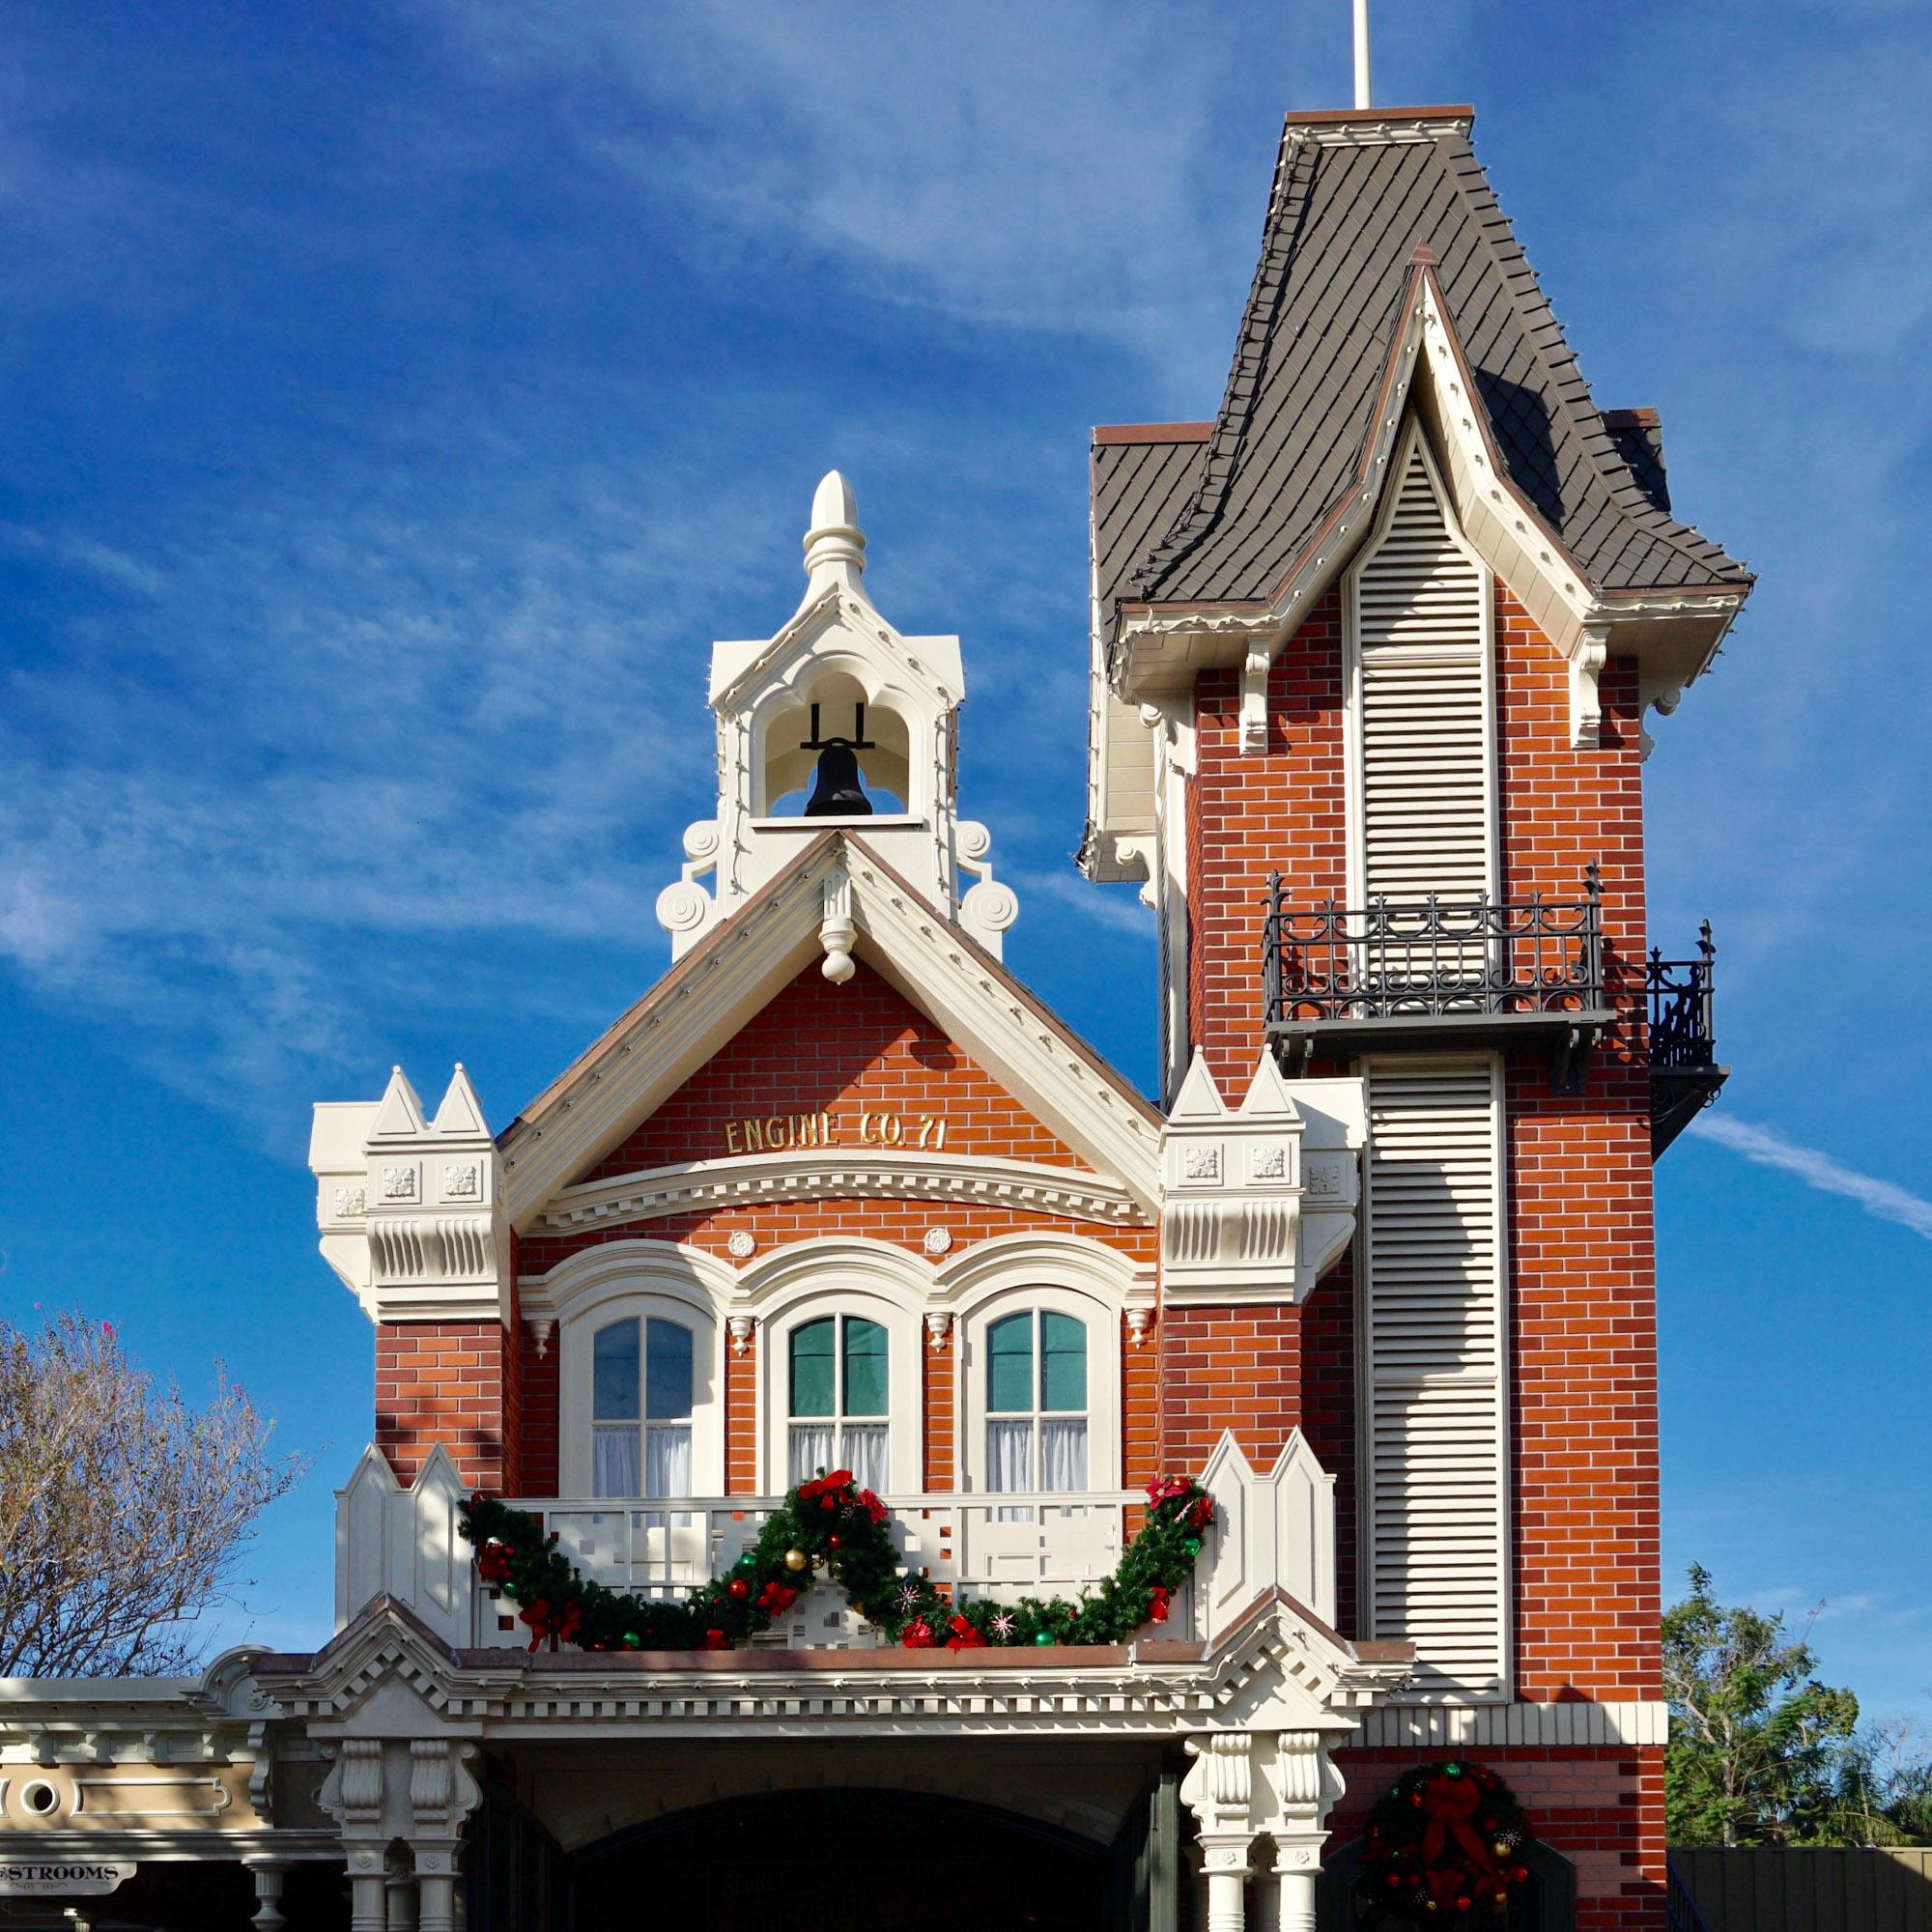 American Adventure at Disney World